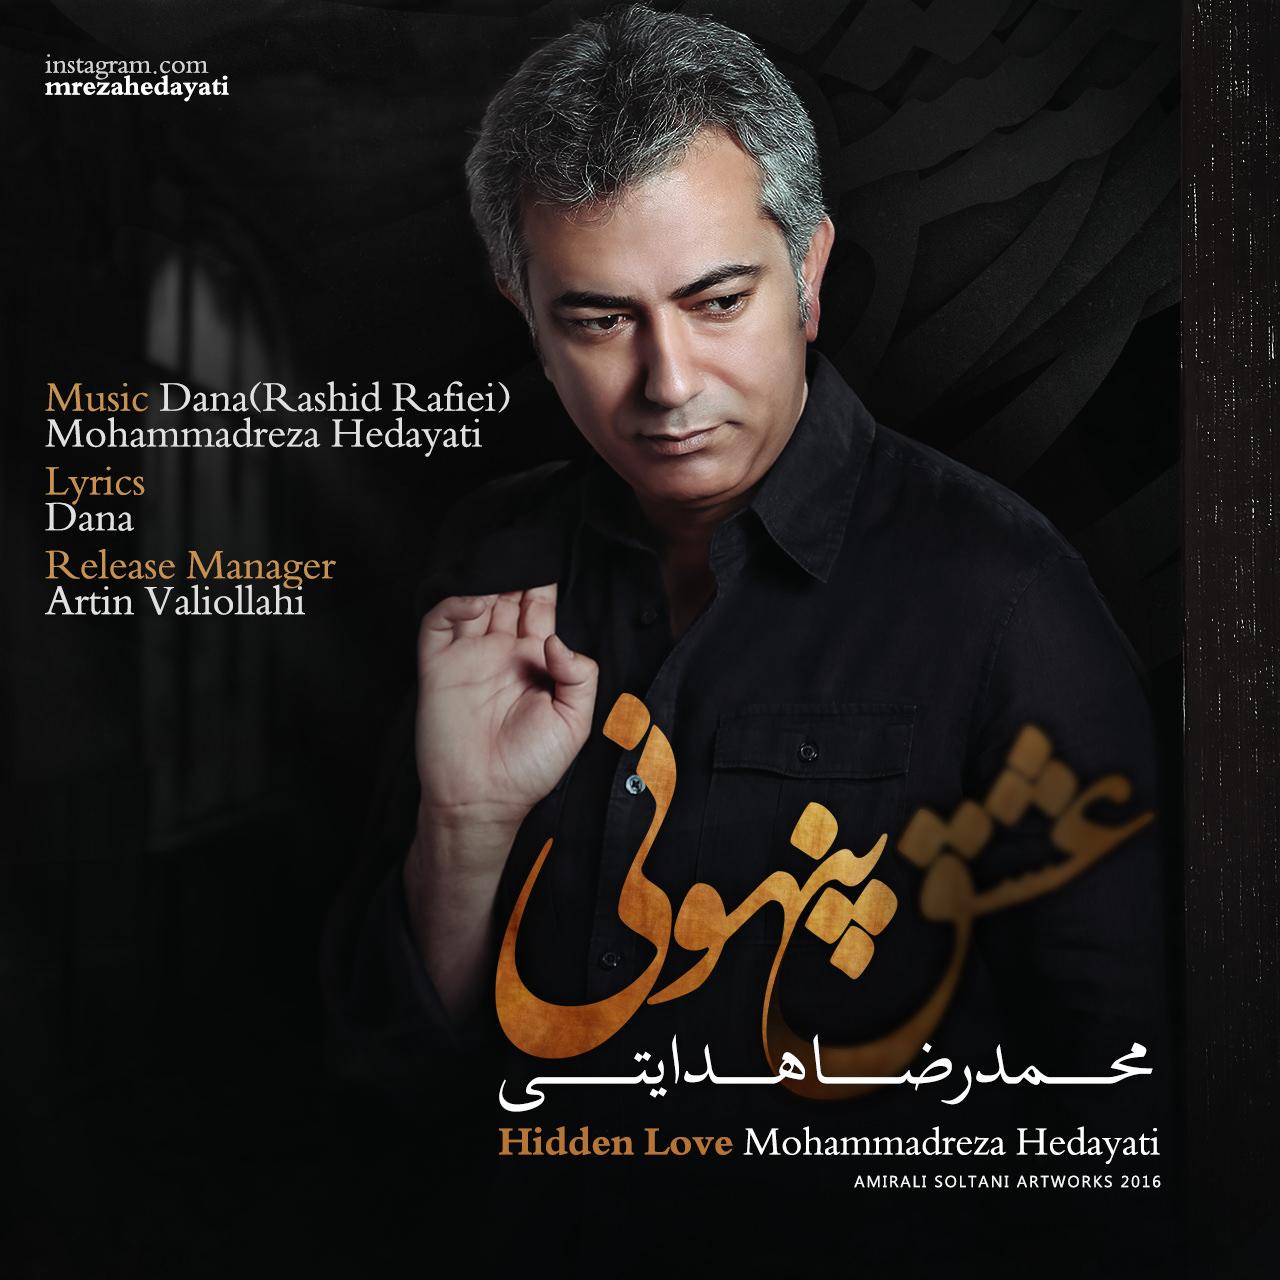 Mohammadreza Hedayati - Eshghe Penhooni.jpg (1280×1280)